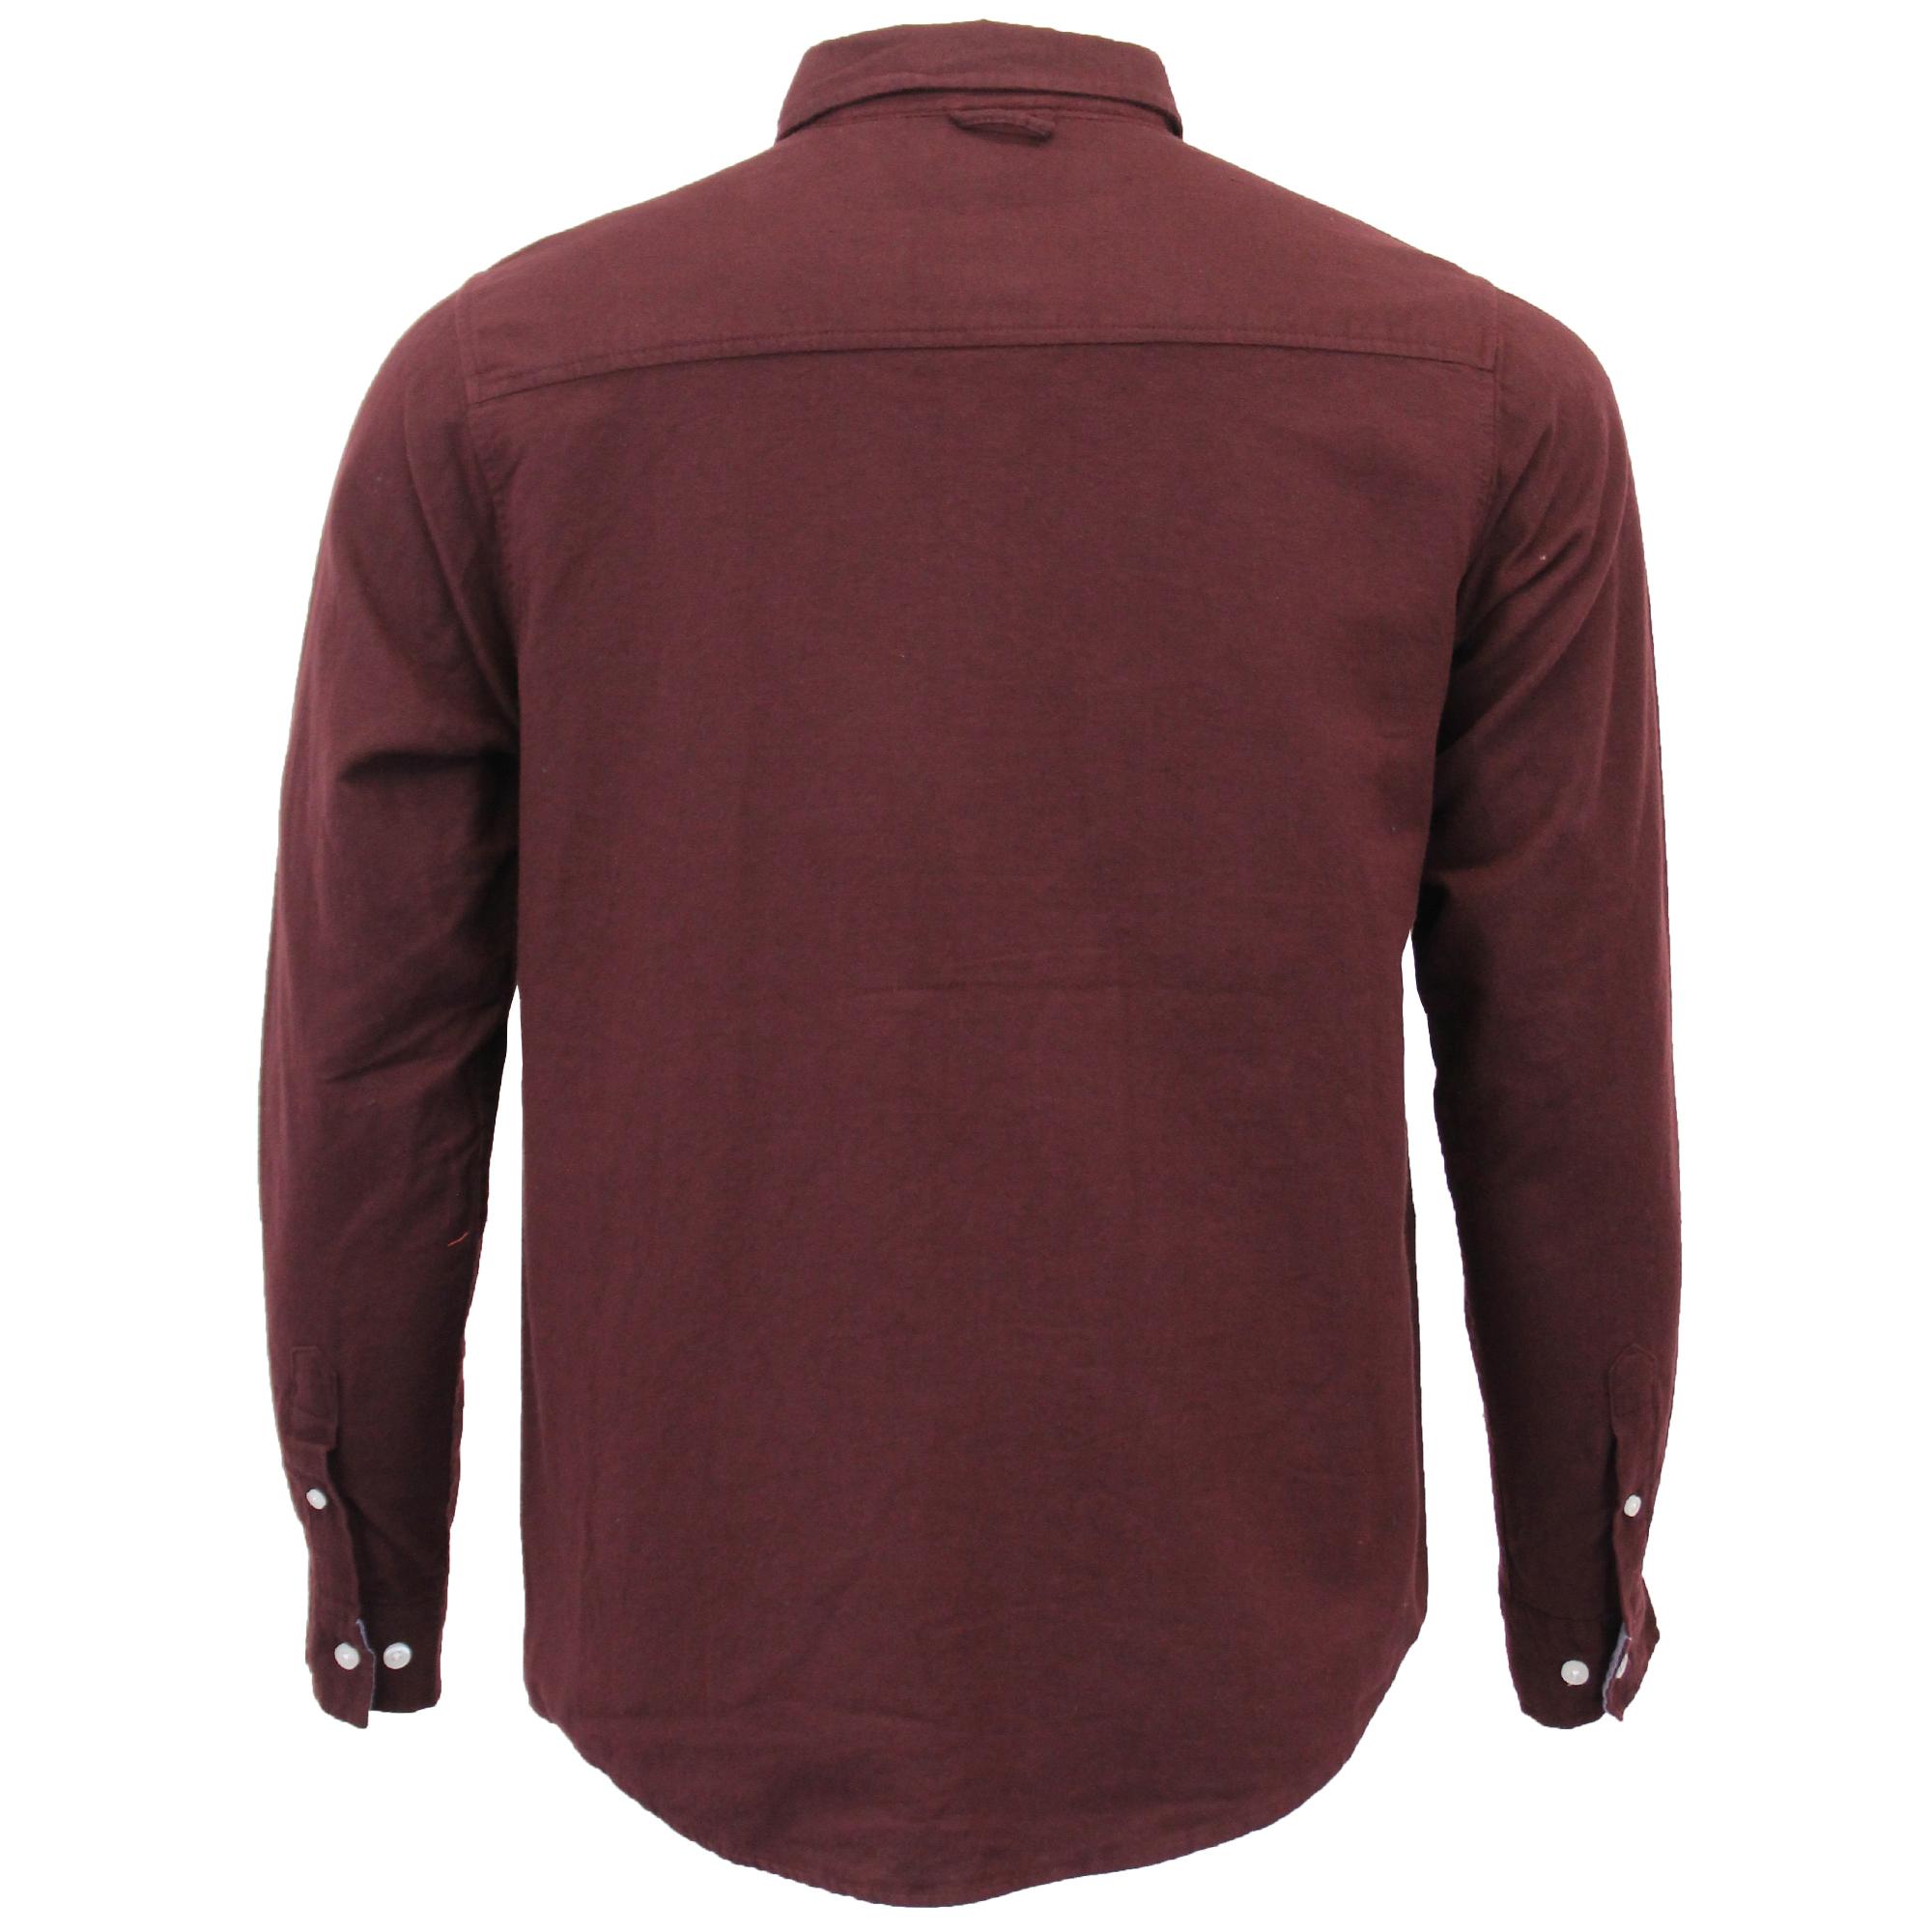 Mens-Brushed-Cotton-Shirt-Brave-Soul-Long-Sleeved-Flannel-HOLMES-Casual-Designer thumbnail 9